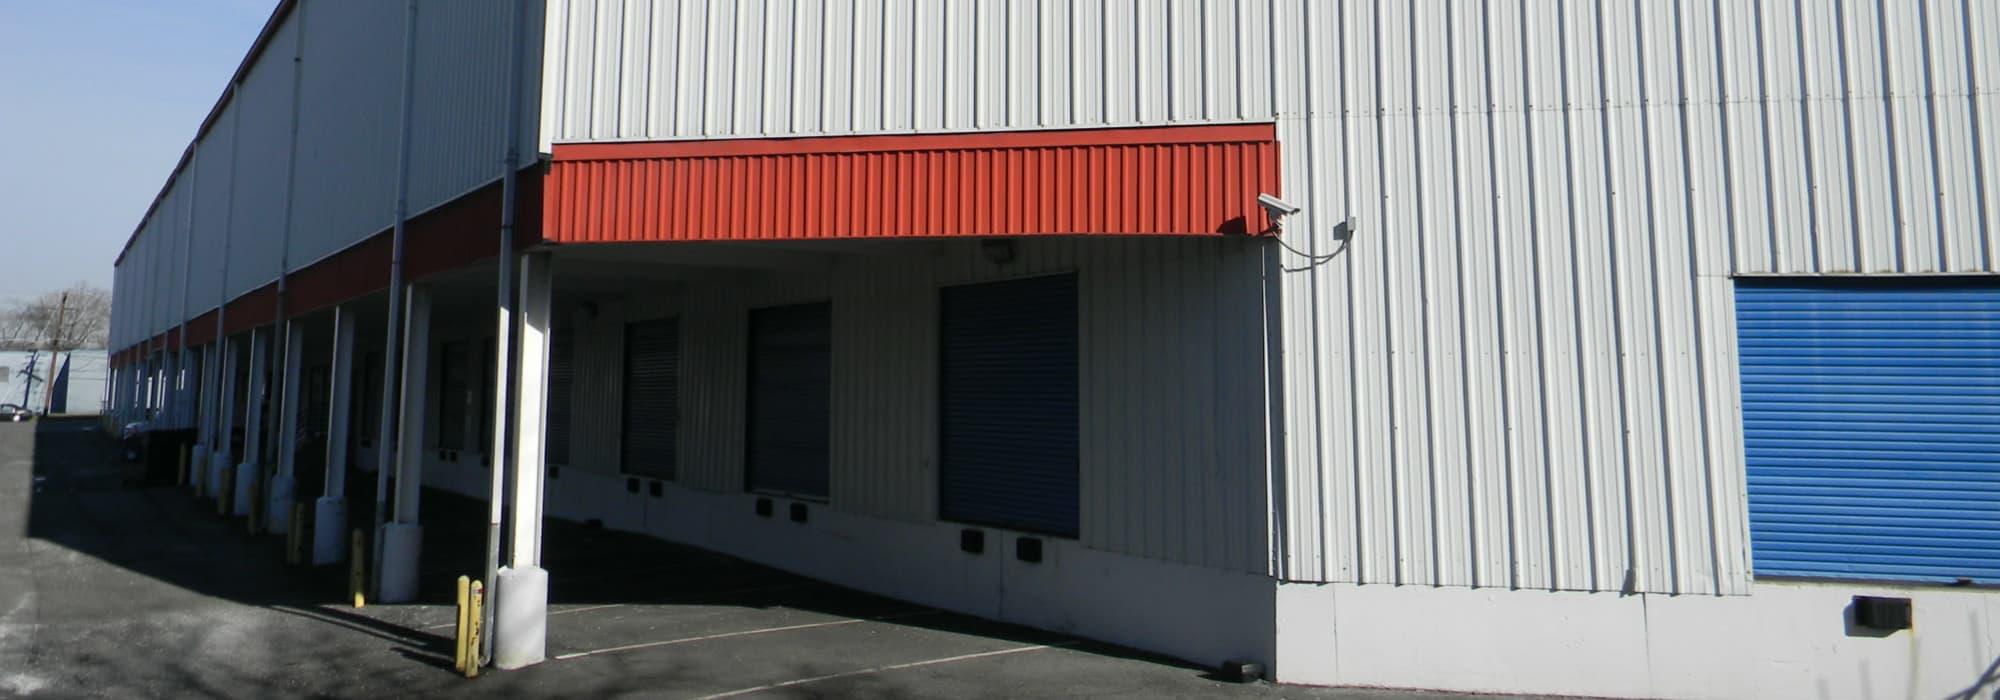 Self storage in Alexandria VA